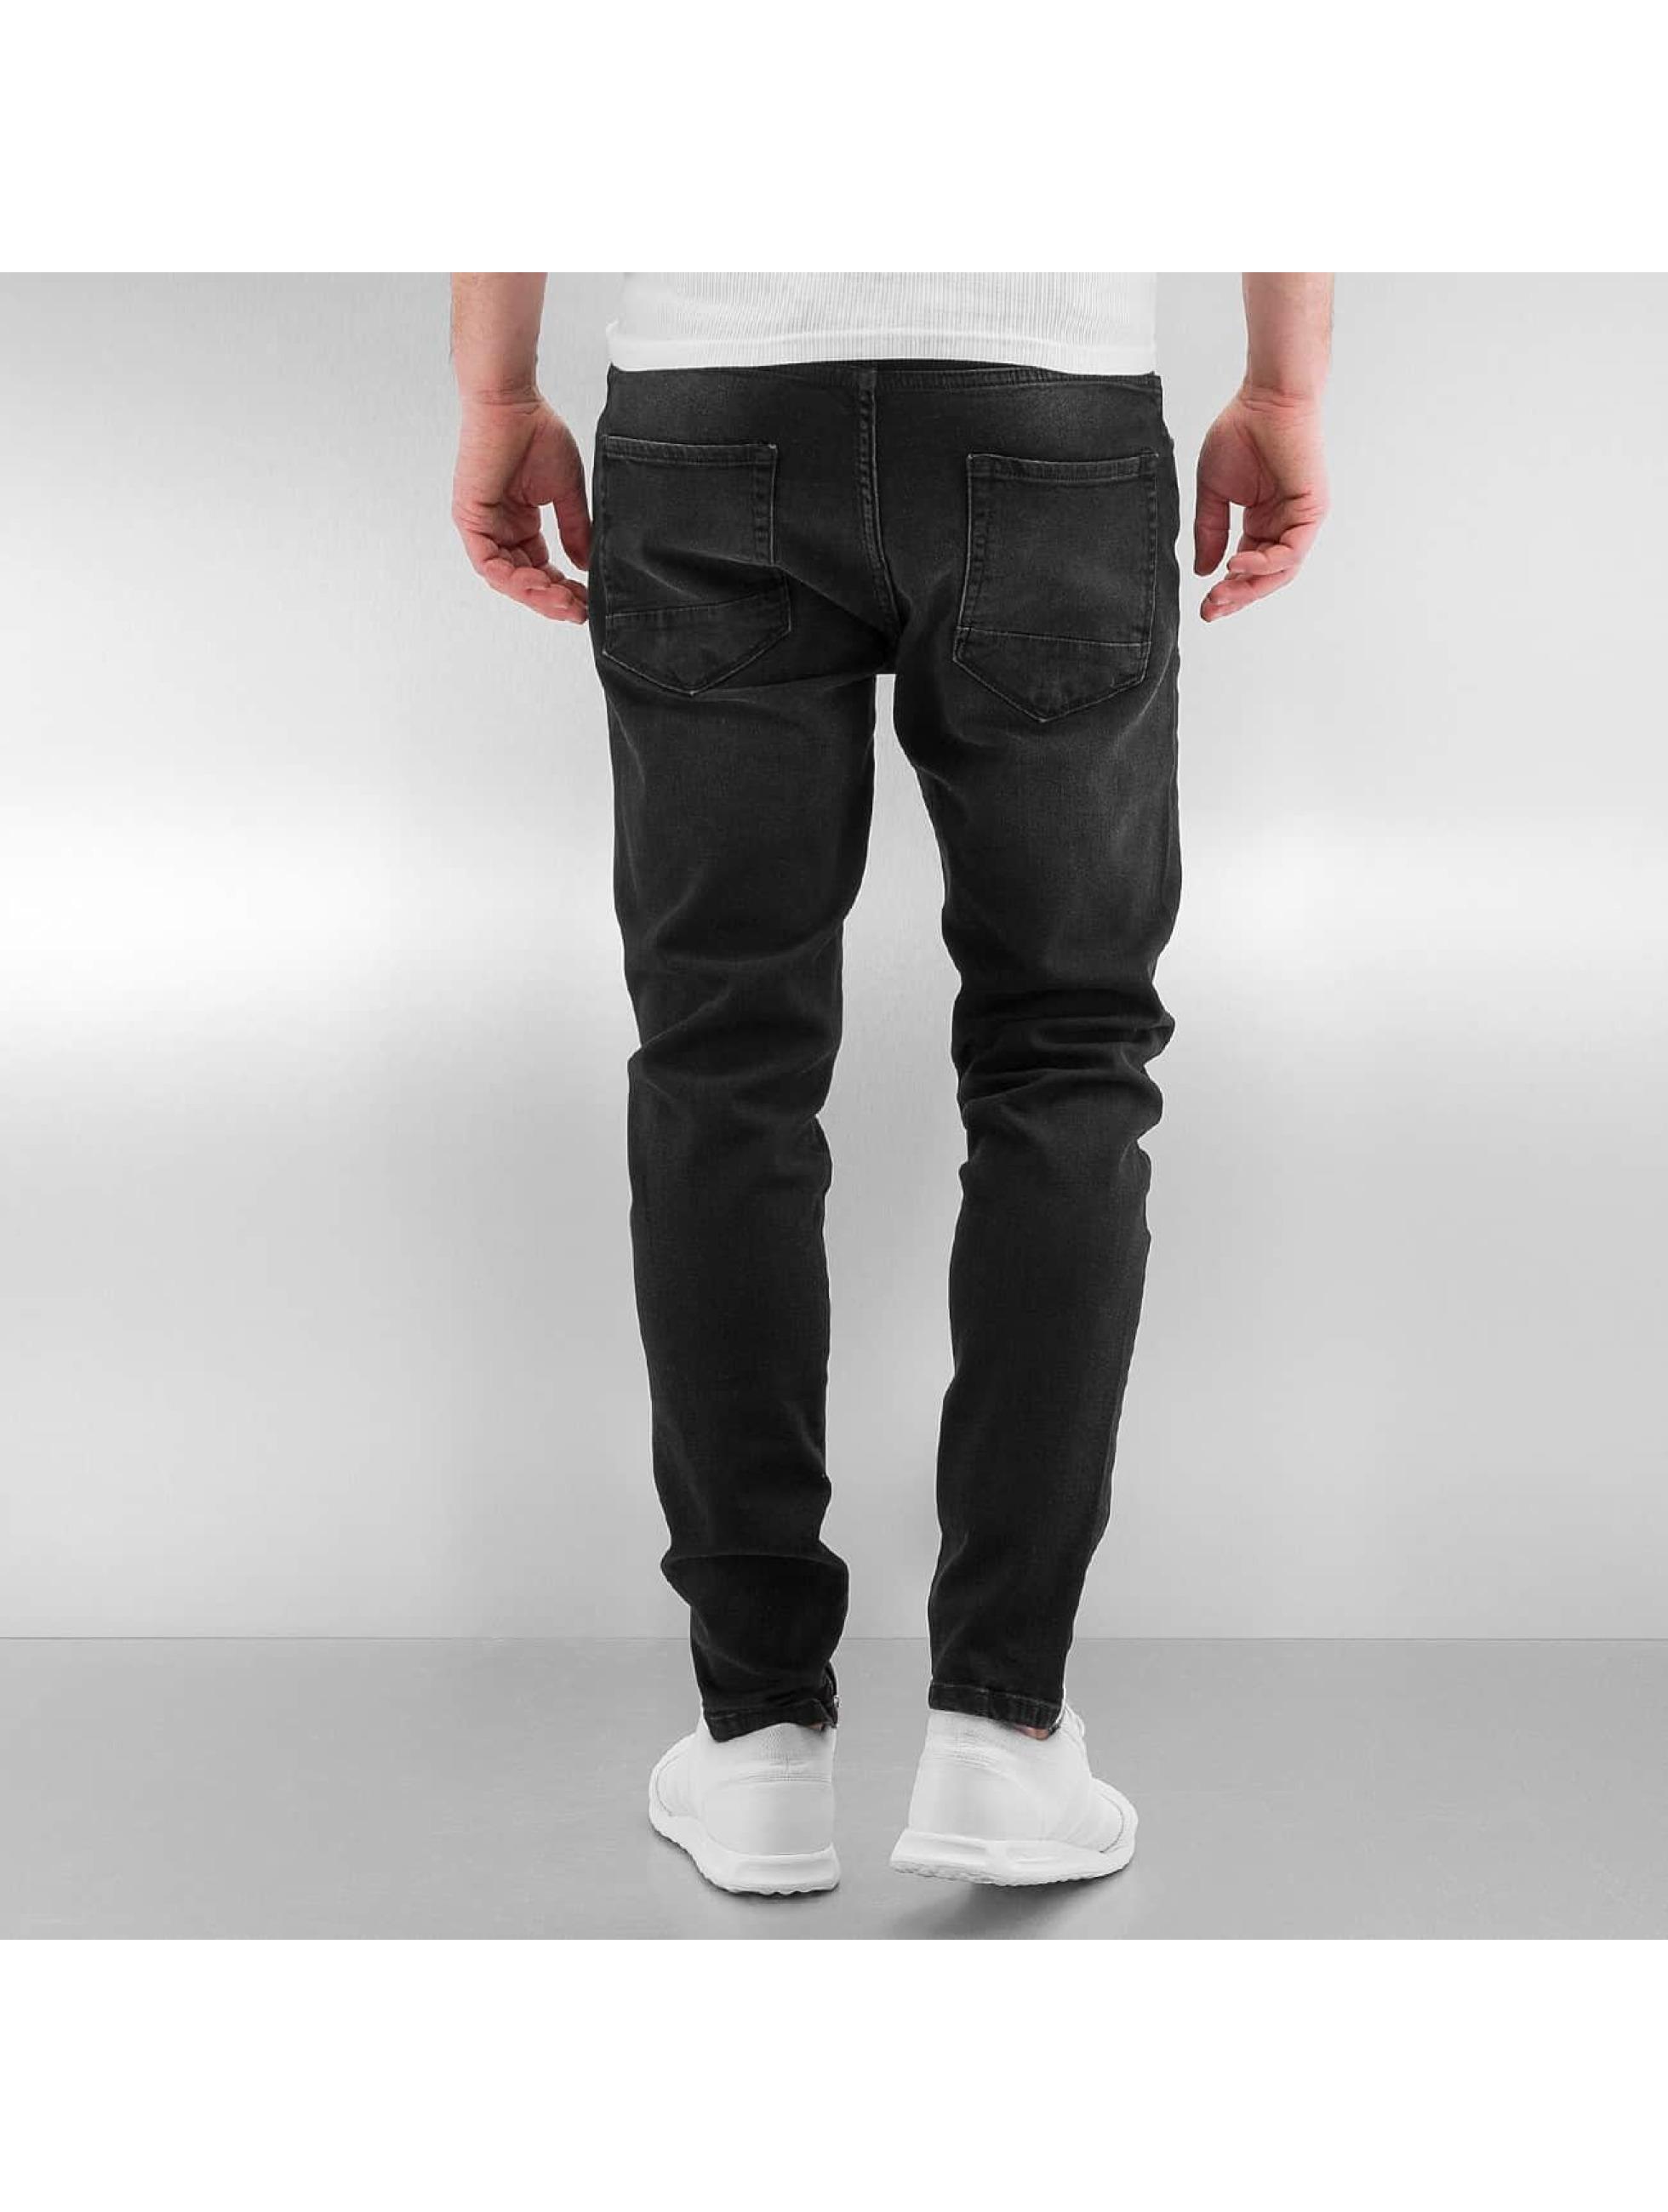 Bangastic Slim Fit Jeans K125 black